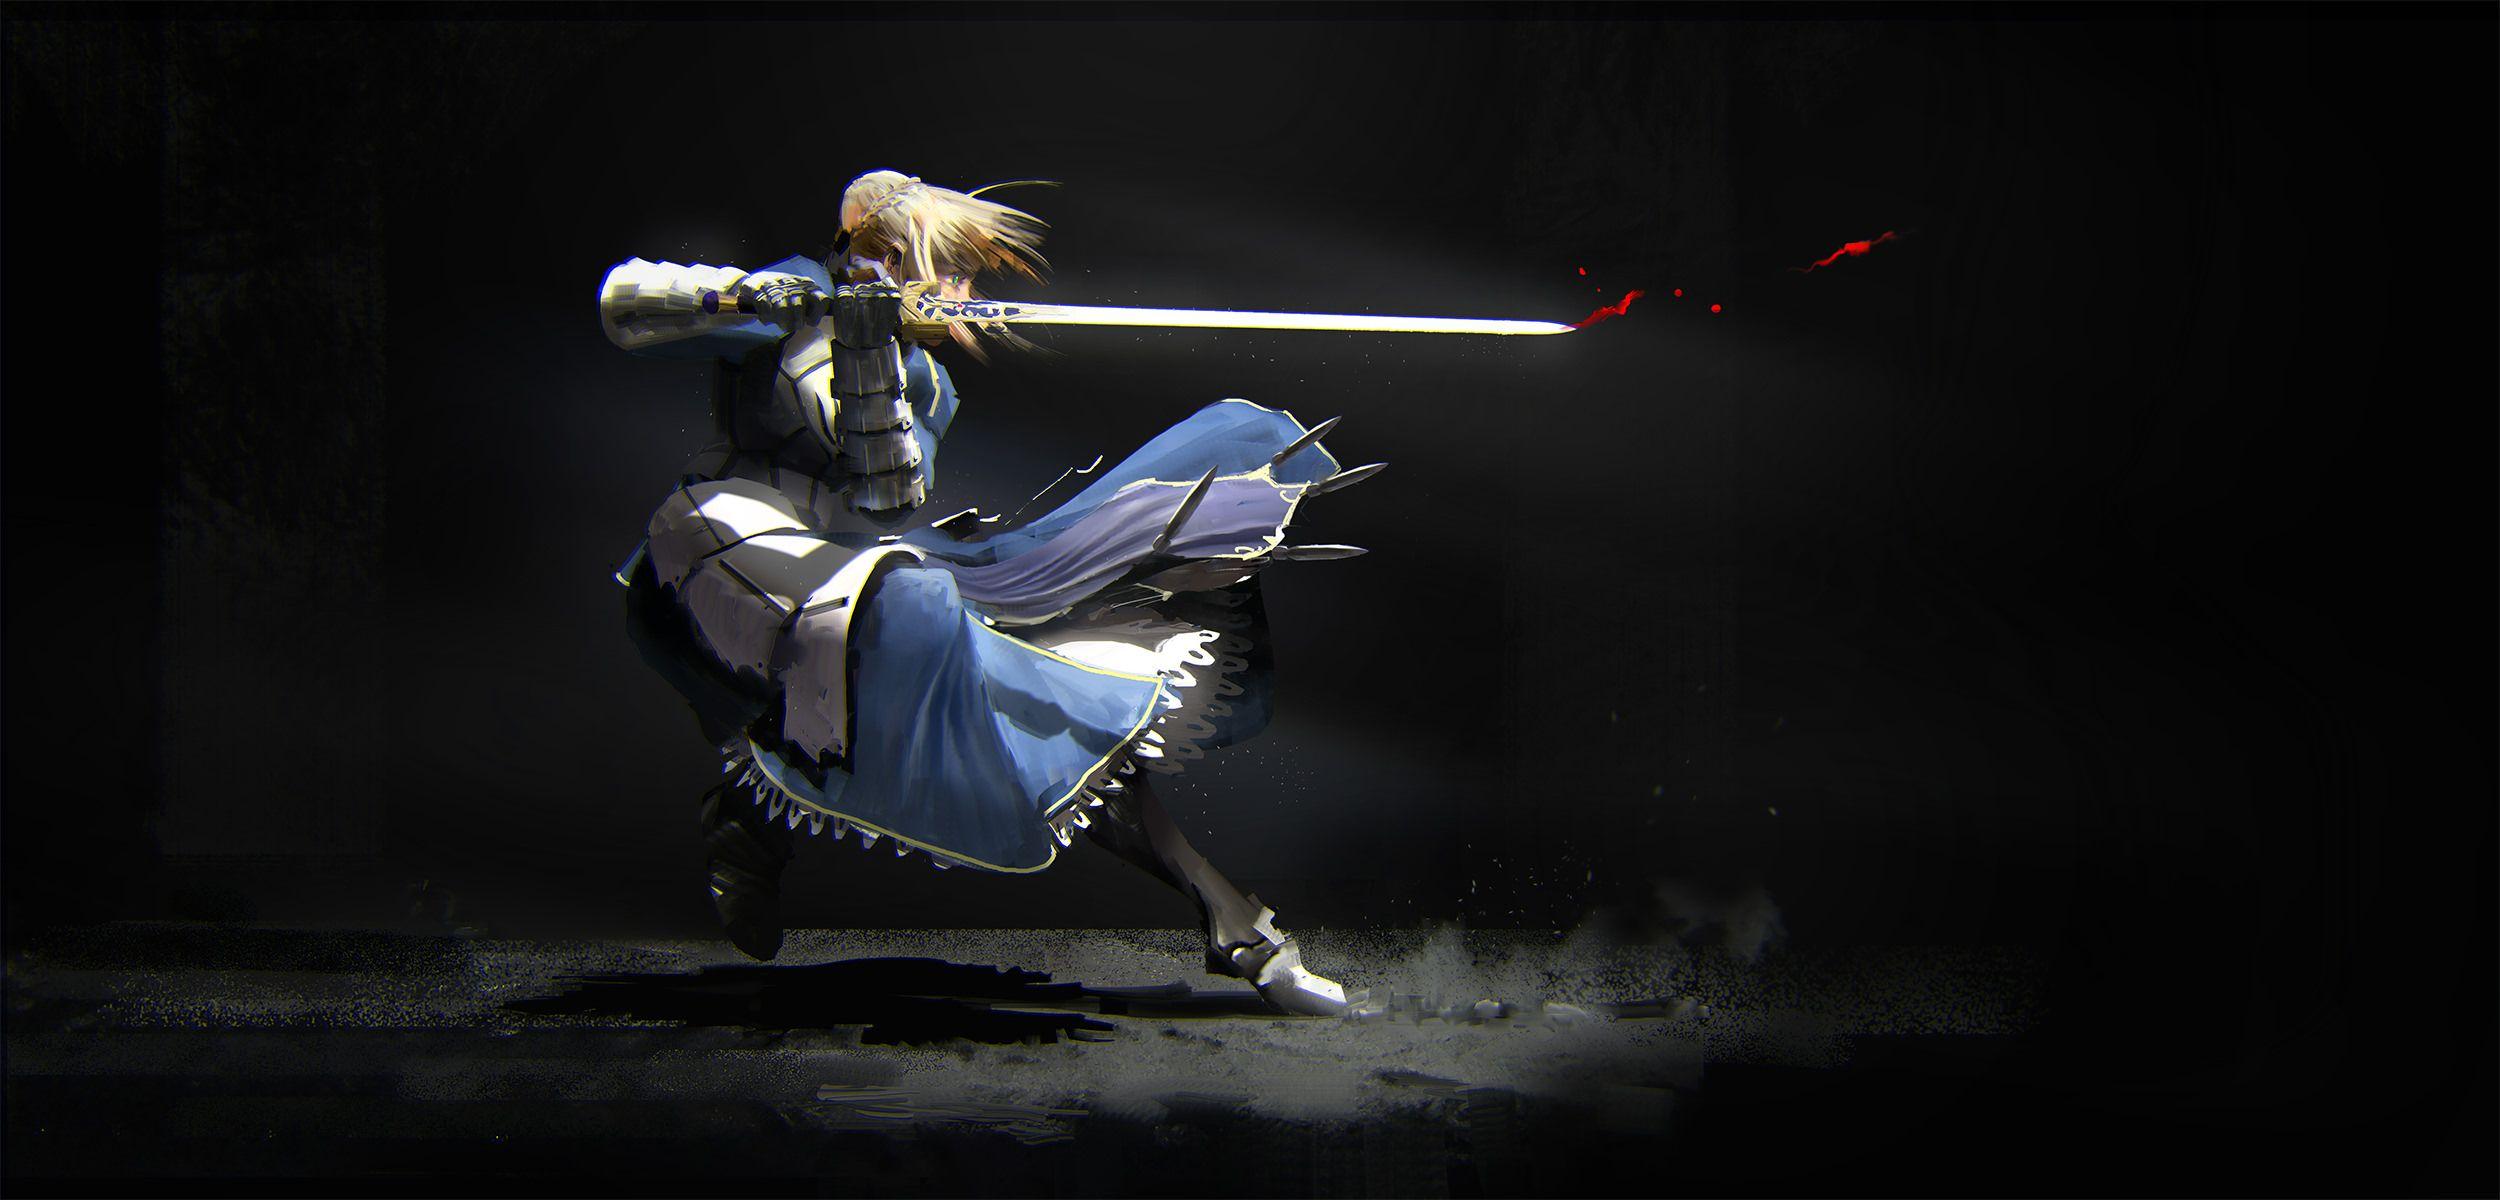 Dark Theme Anime Wallpapers - Wallpaper Cave